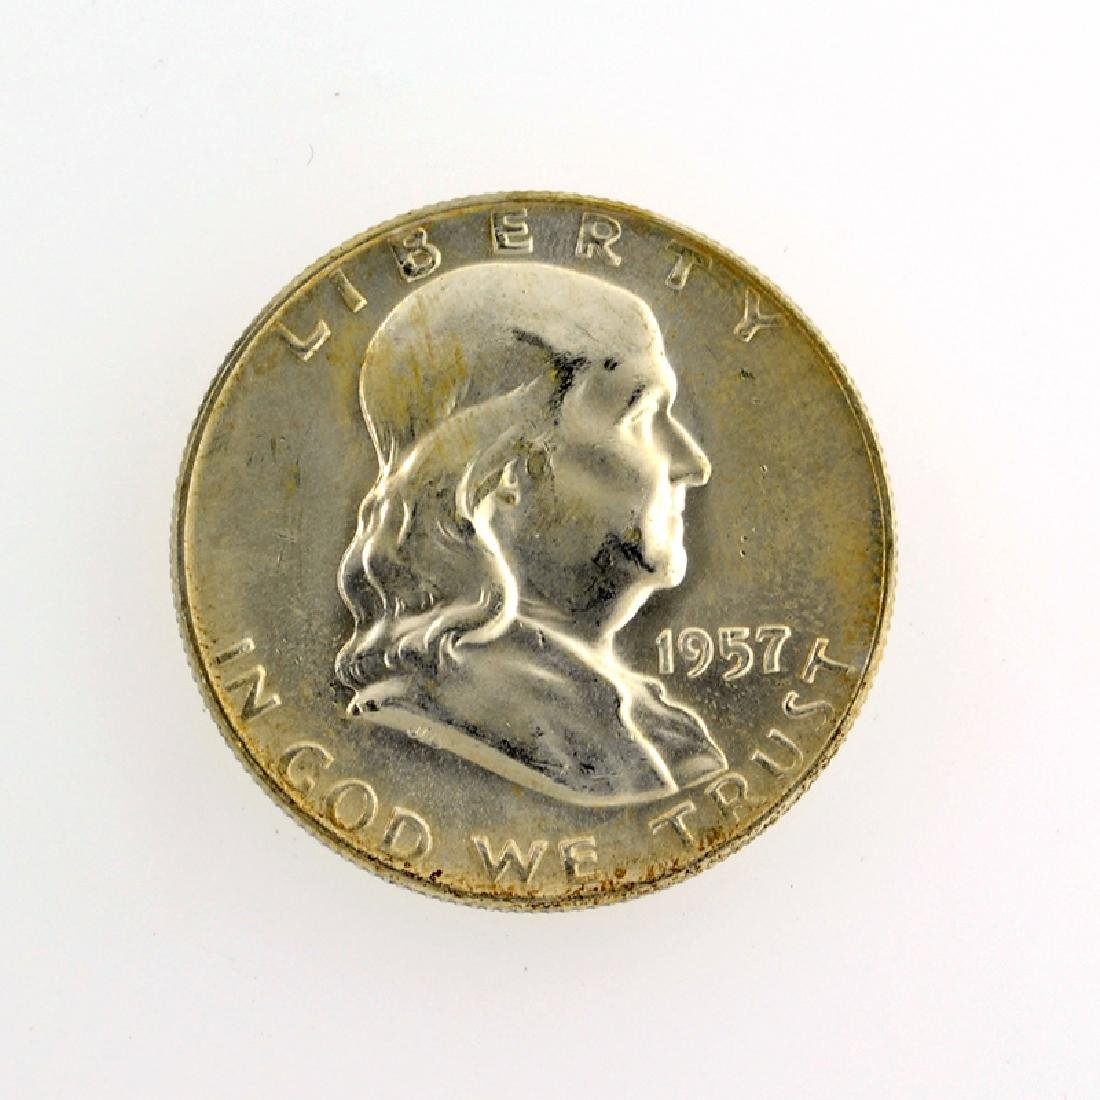 1957-D Franklin Liberty Bell Half Dollar Coin